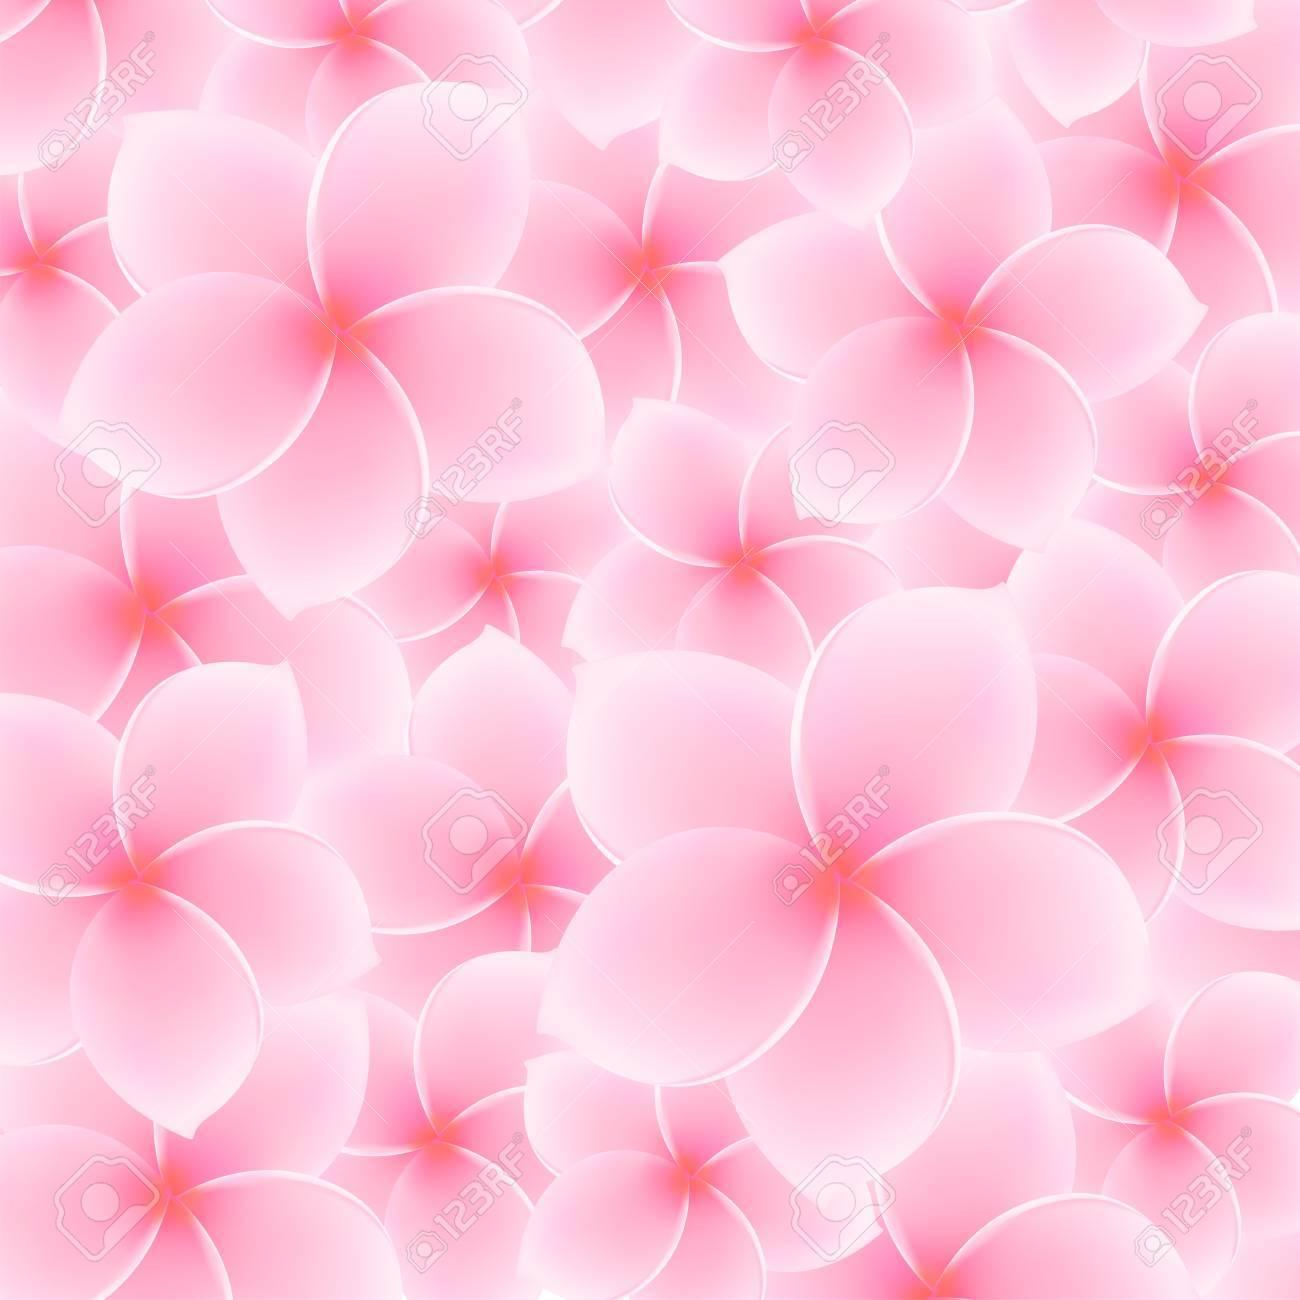 Tropical Pink Plumeria, Frangipani pattern  background Stock Vector - 21824686